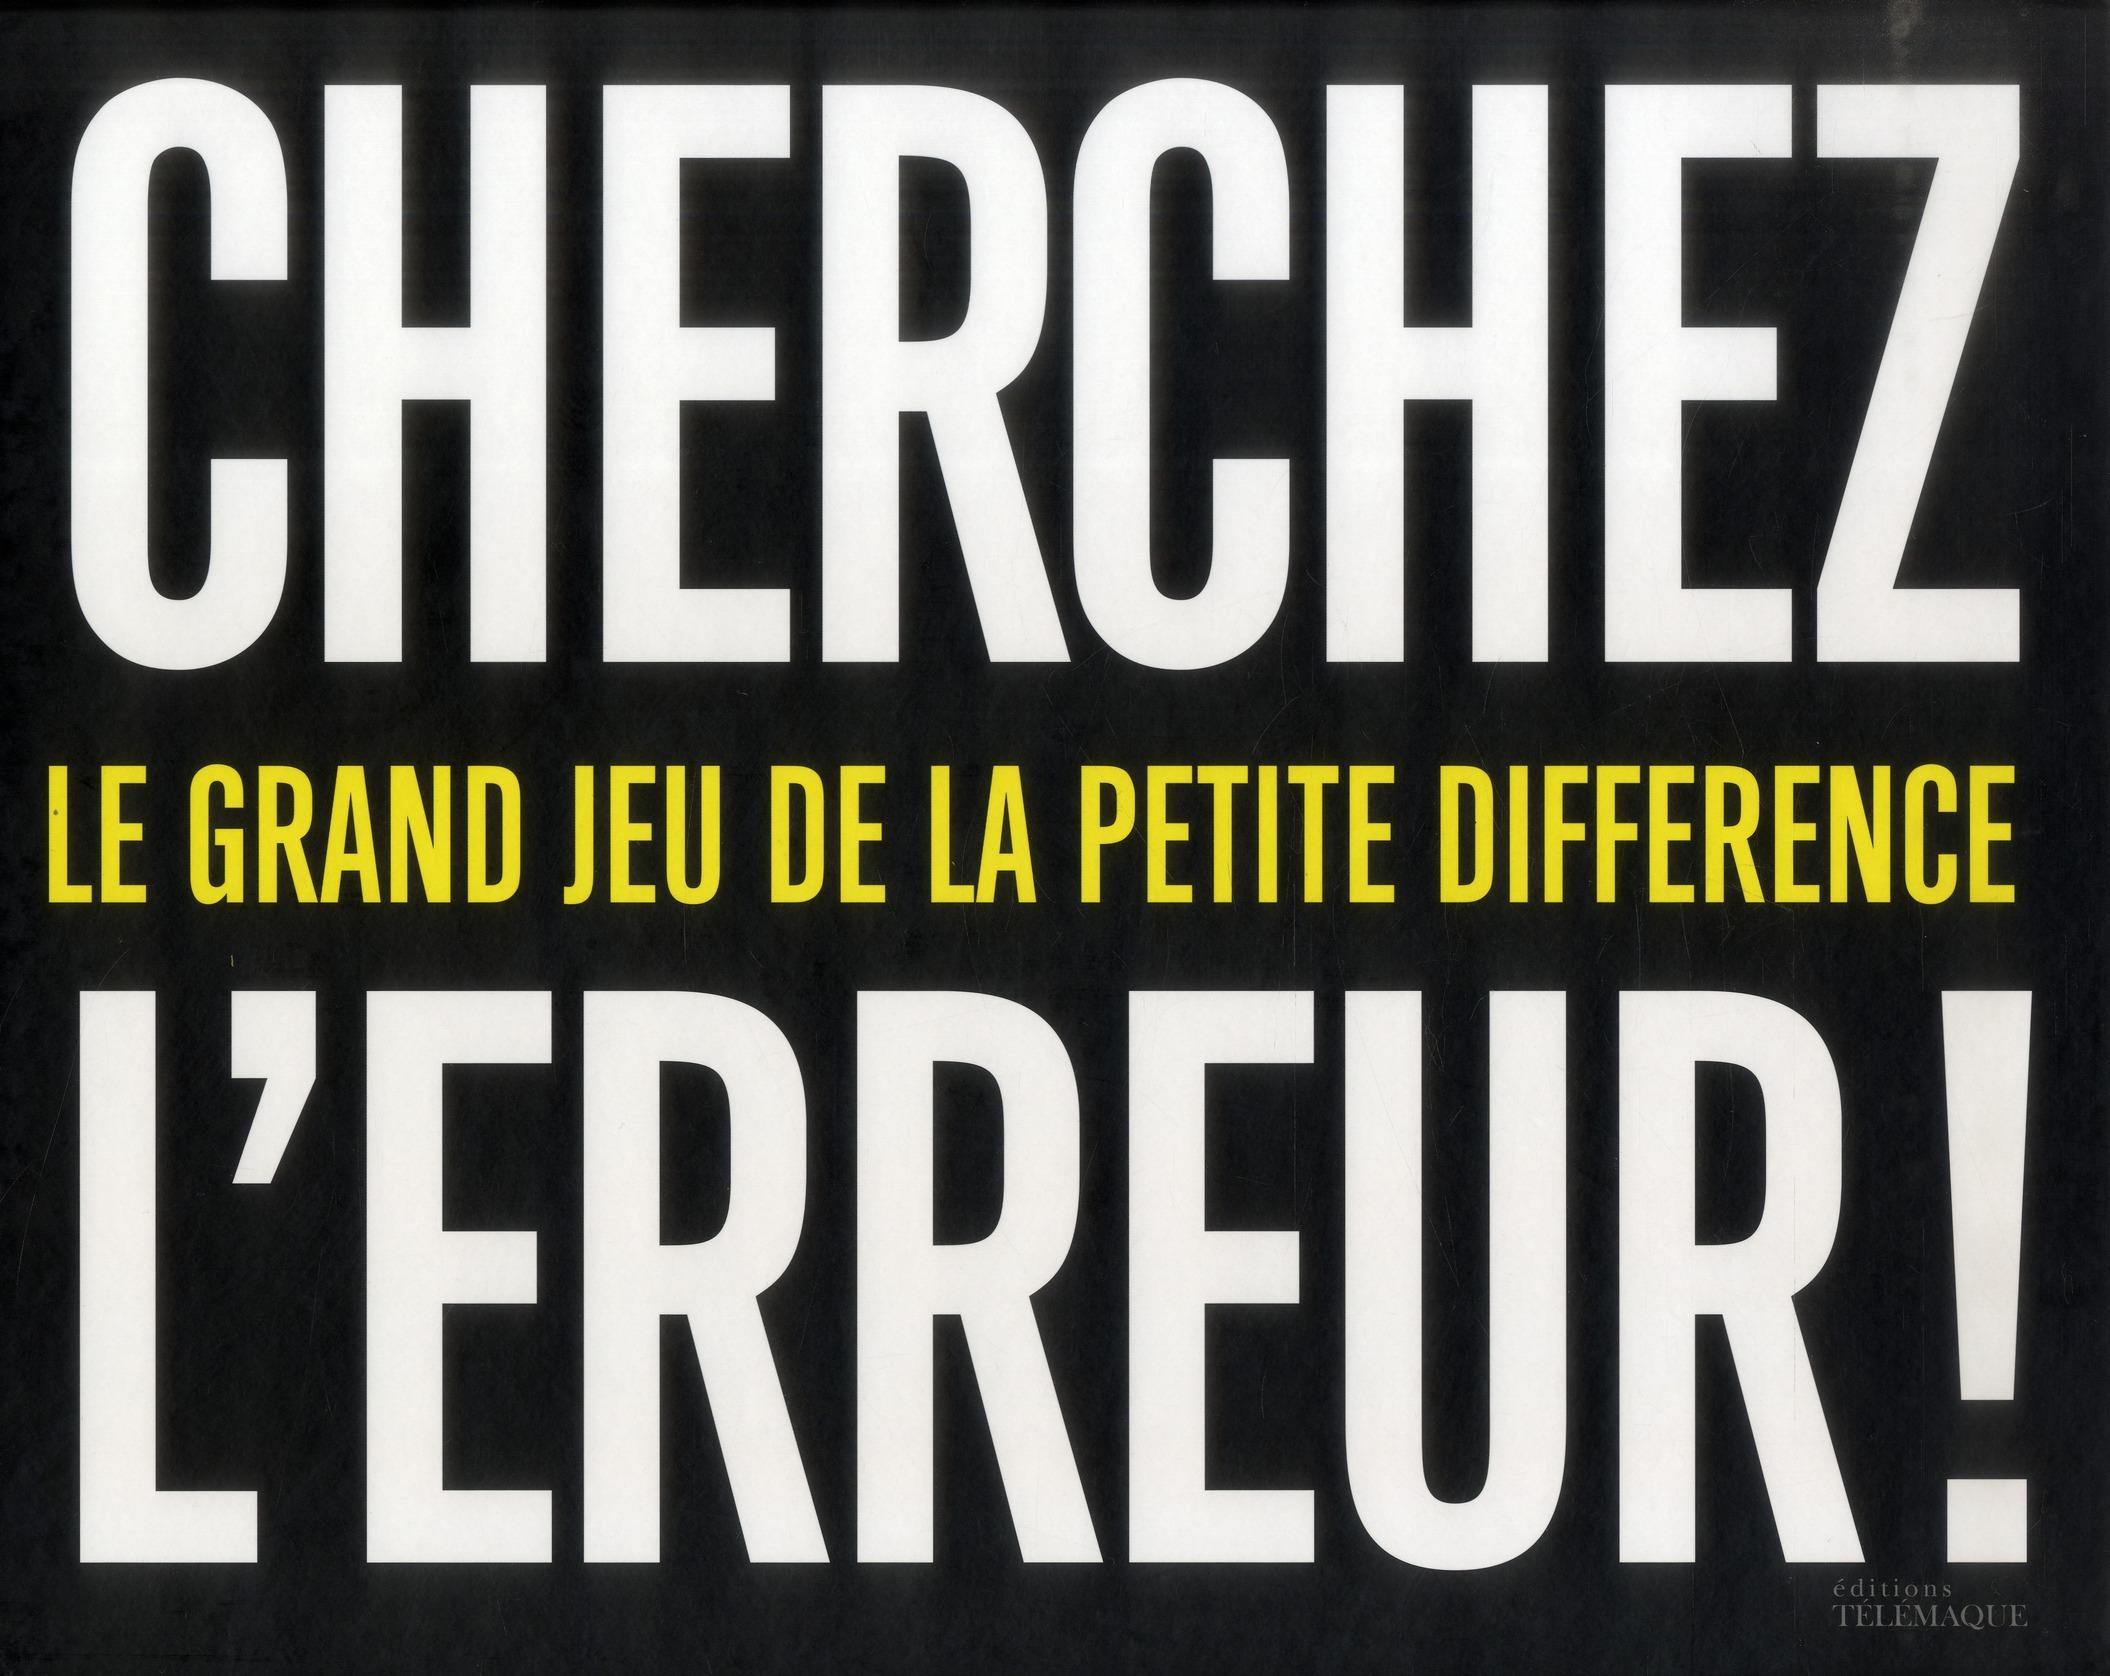 CHERCHEZ L ERREUR